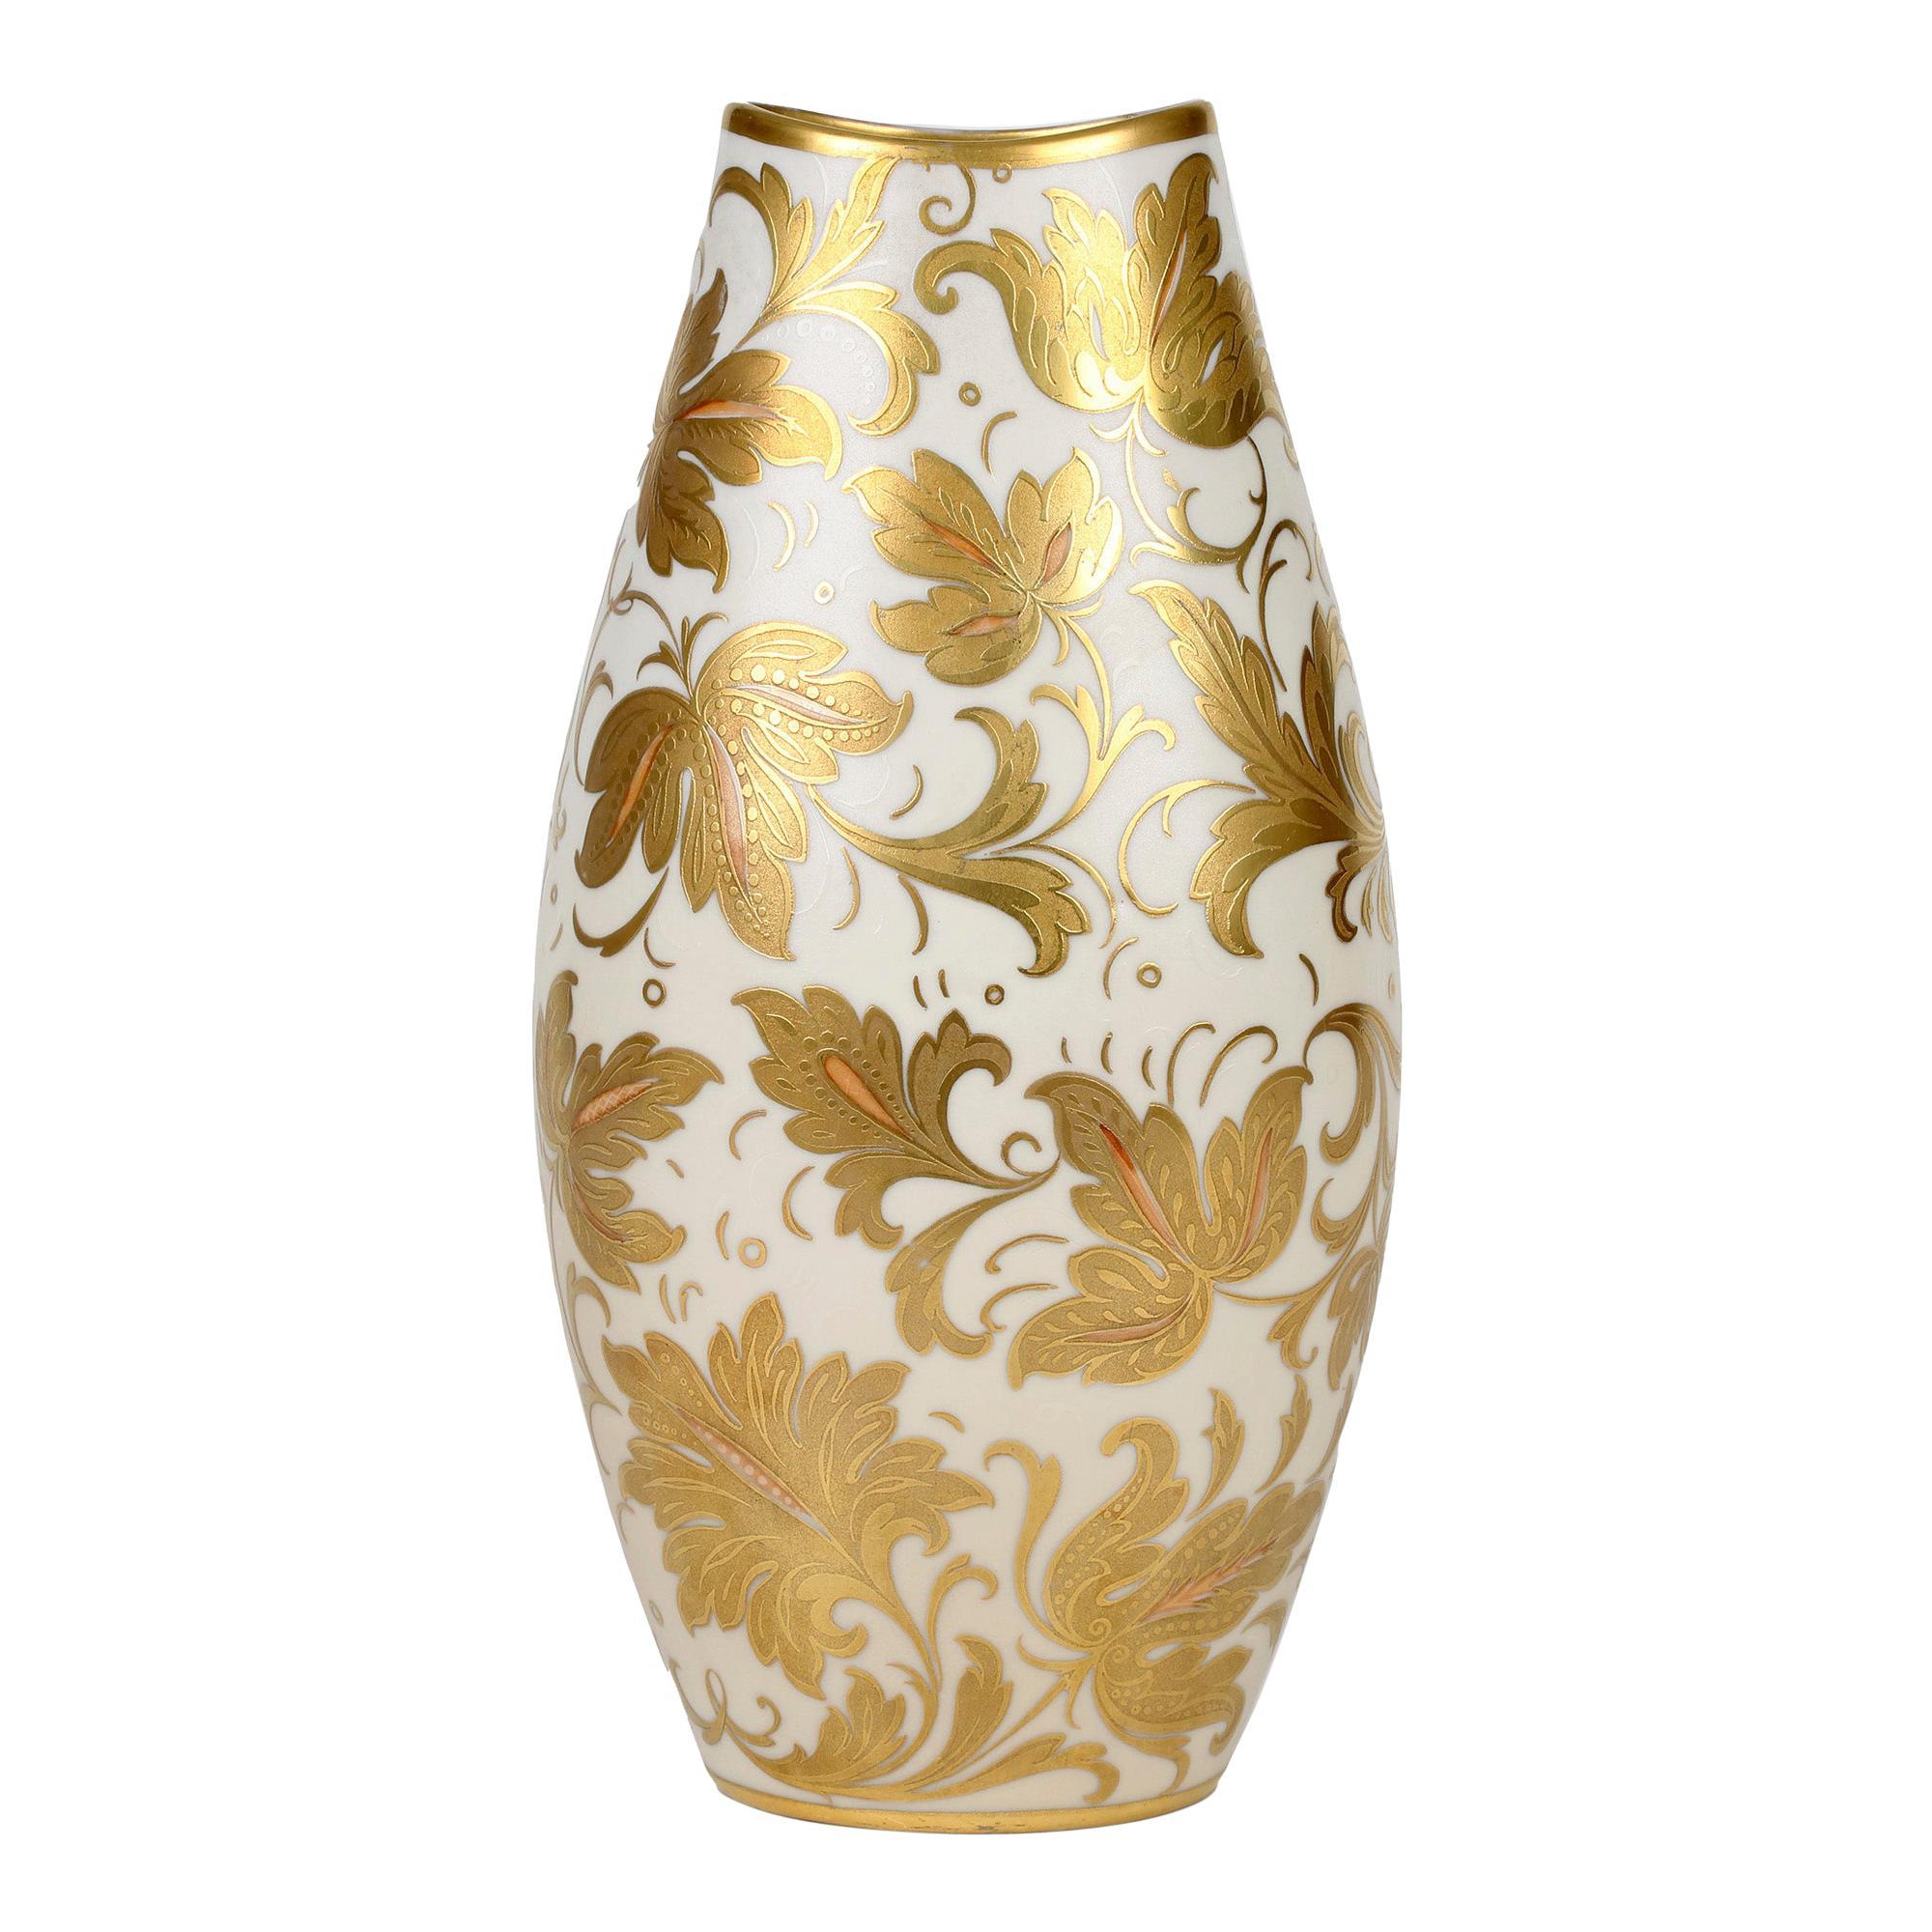 Arrigo Finzi Italian Mid Century Oro Zecchino Leaf Design Porcelain Vase